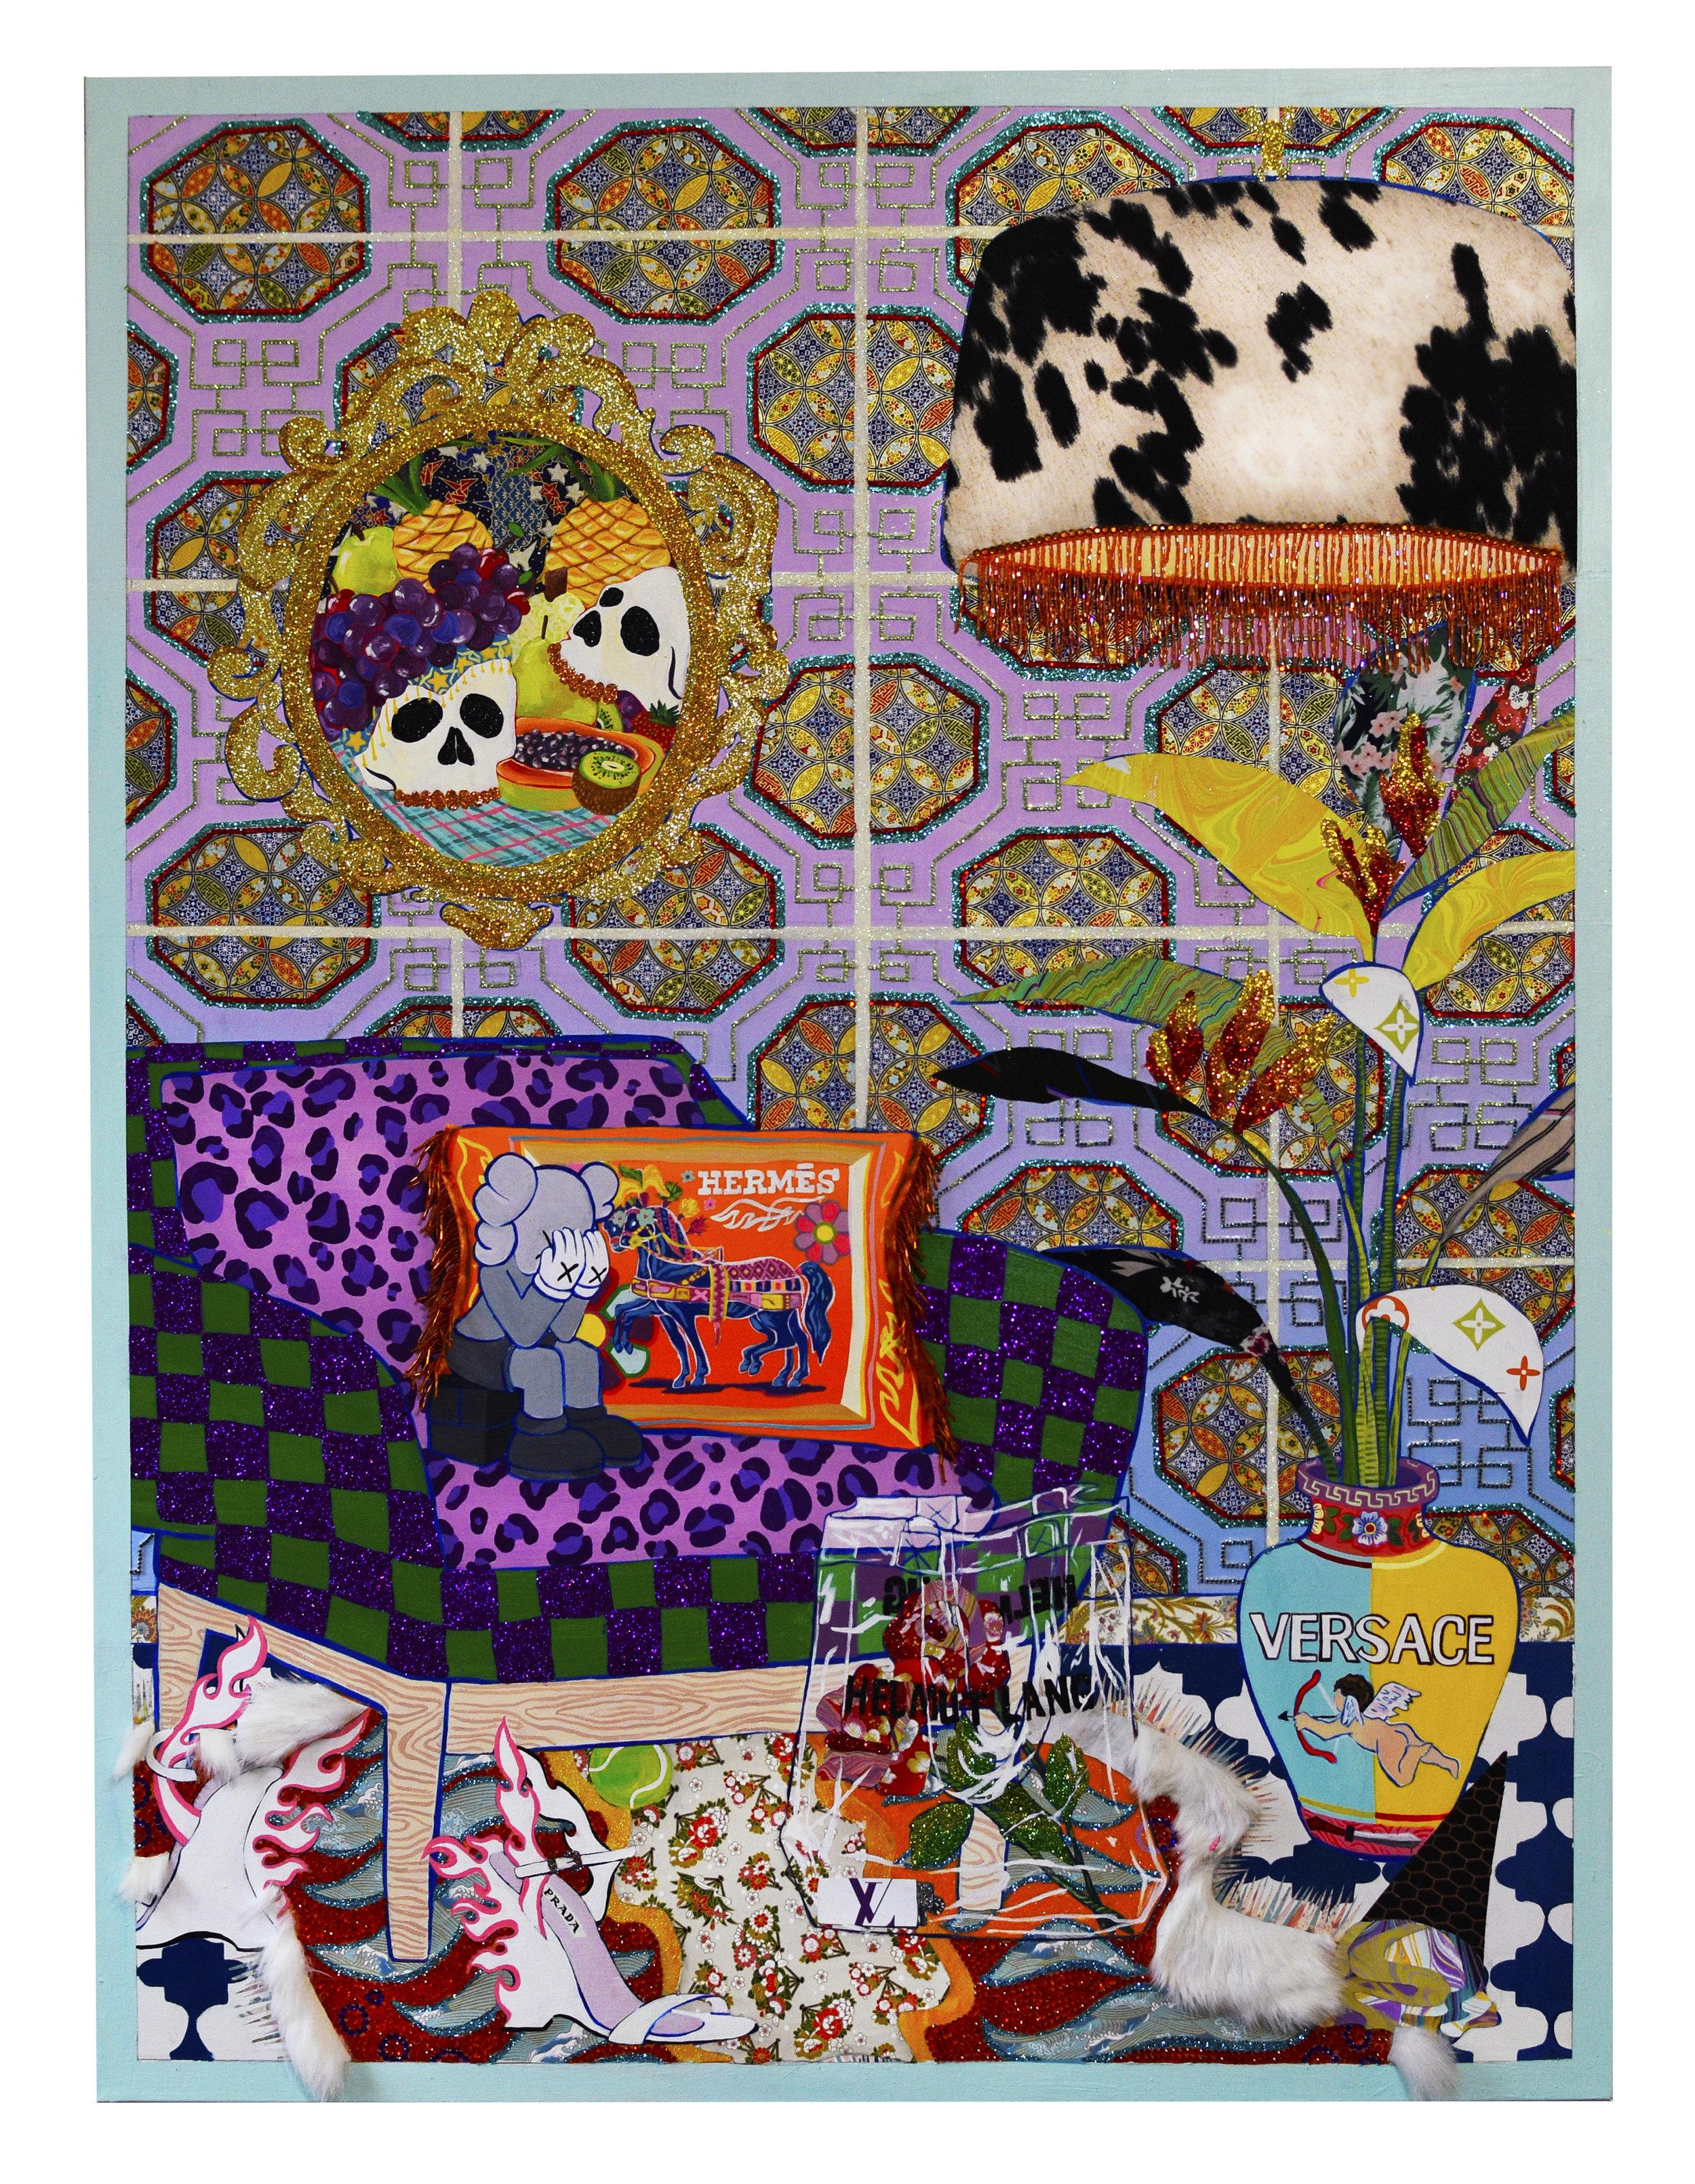 RACHAEL TARRAVECHIA    Airmez , 2018  Acrylic, glitter, rhinestones, paper, and rabbit fur on canvas  48 x 36 inches